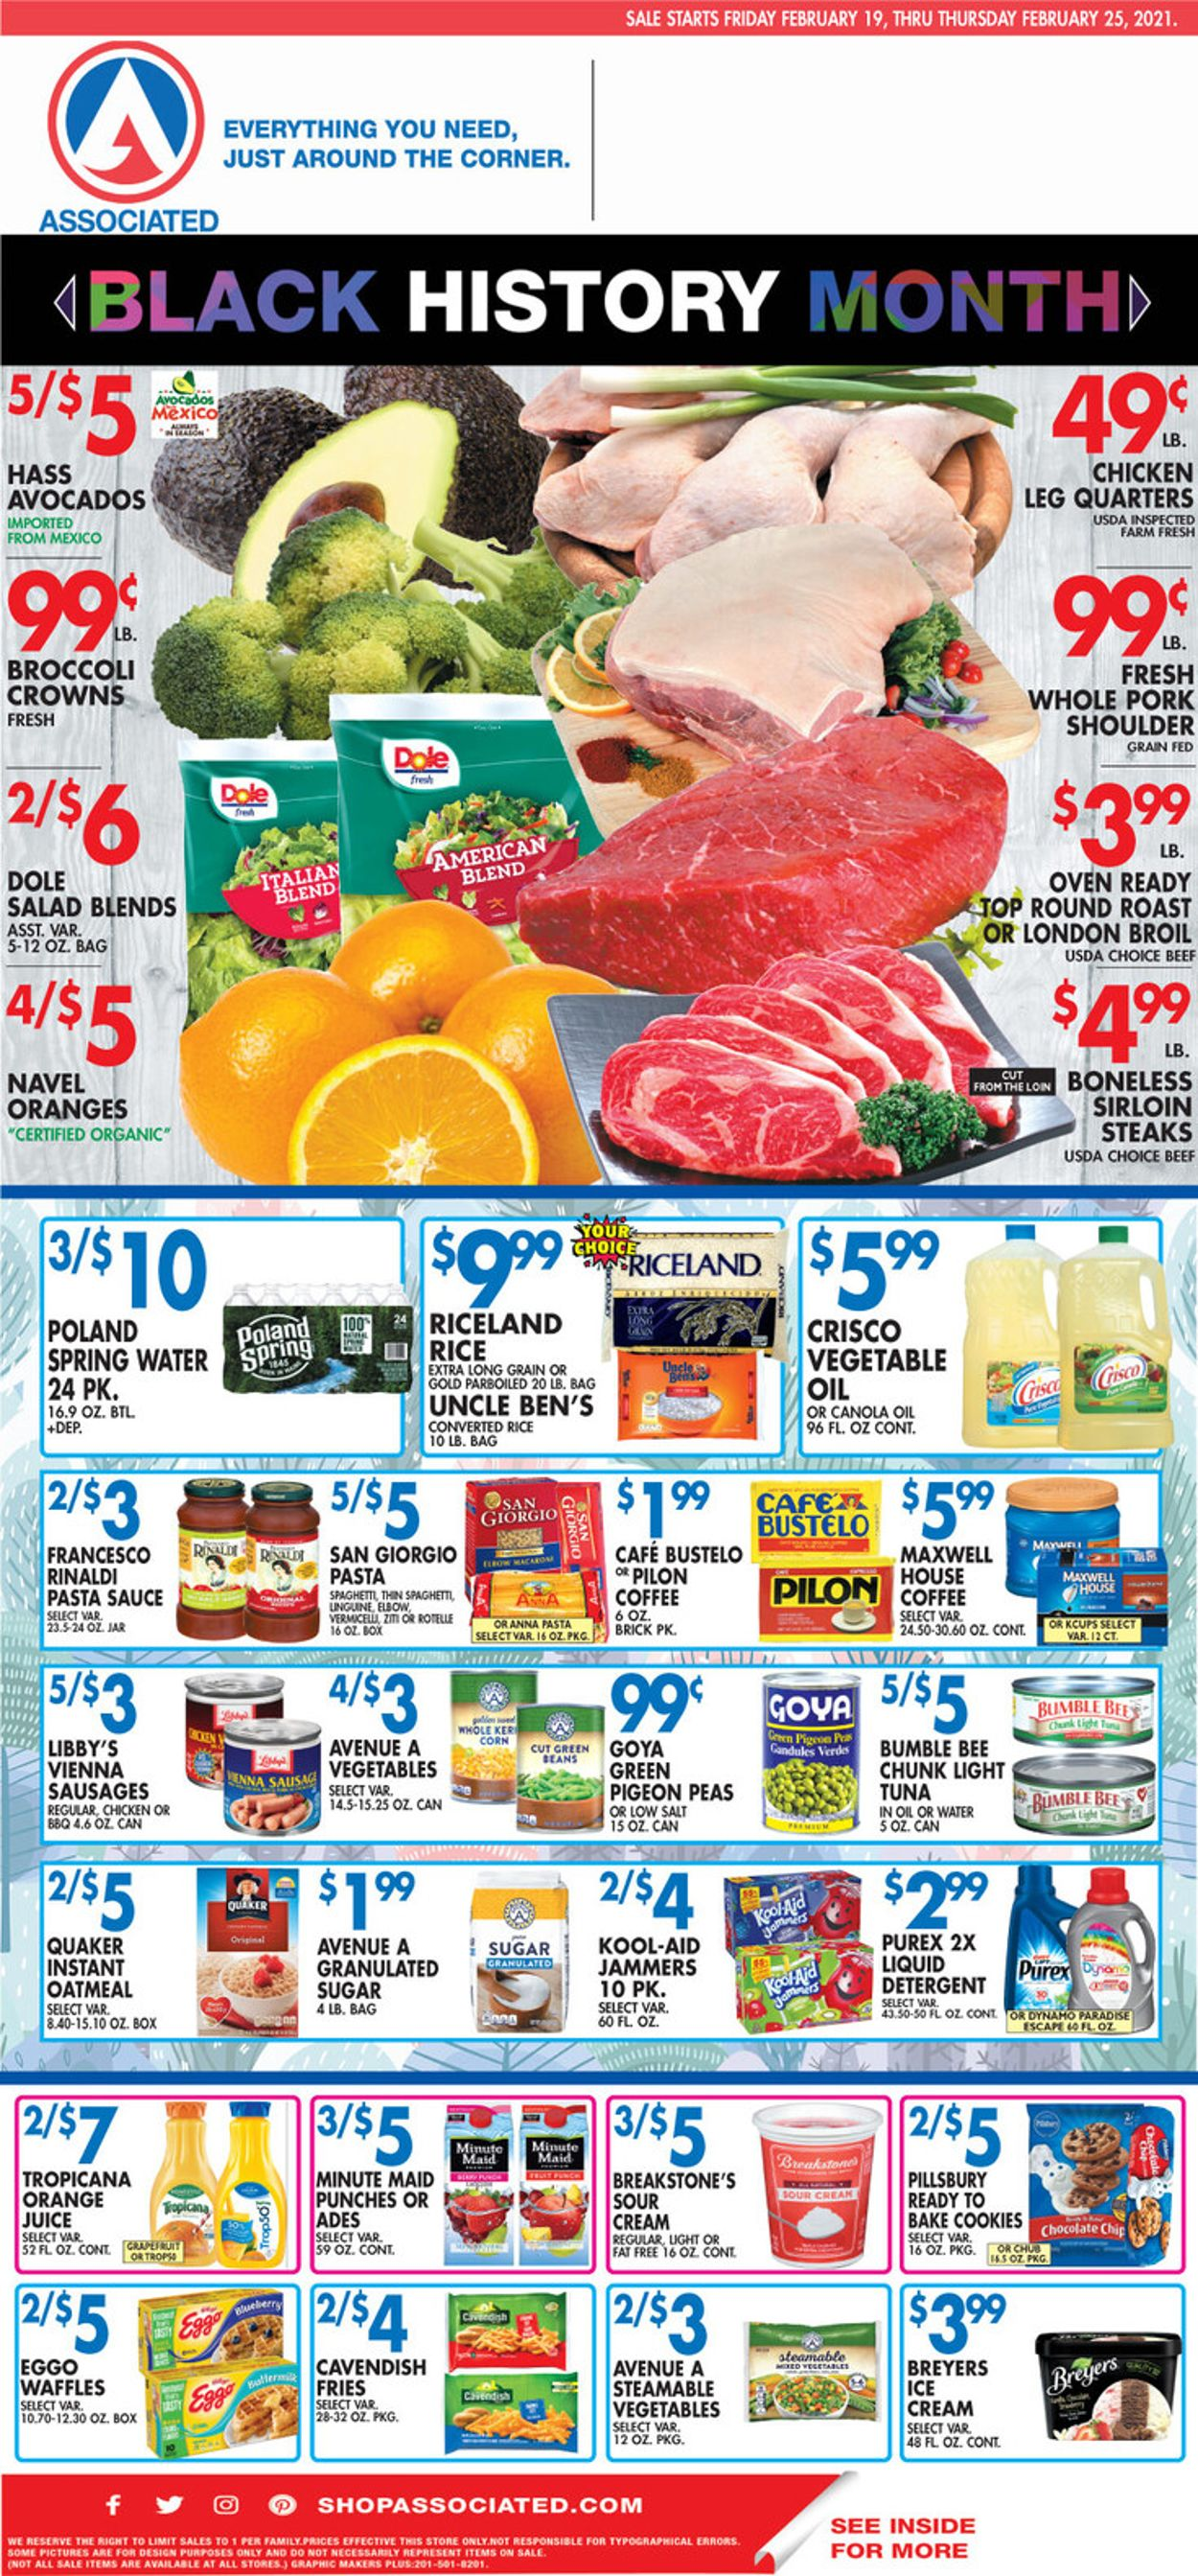 Associated Supermarkets Weekly Ad Circular - valid 02/19-02/25/2021